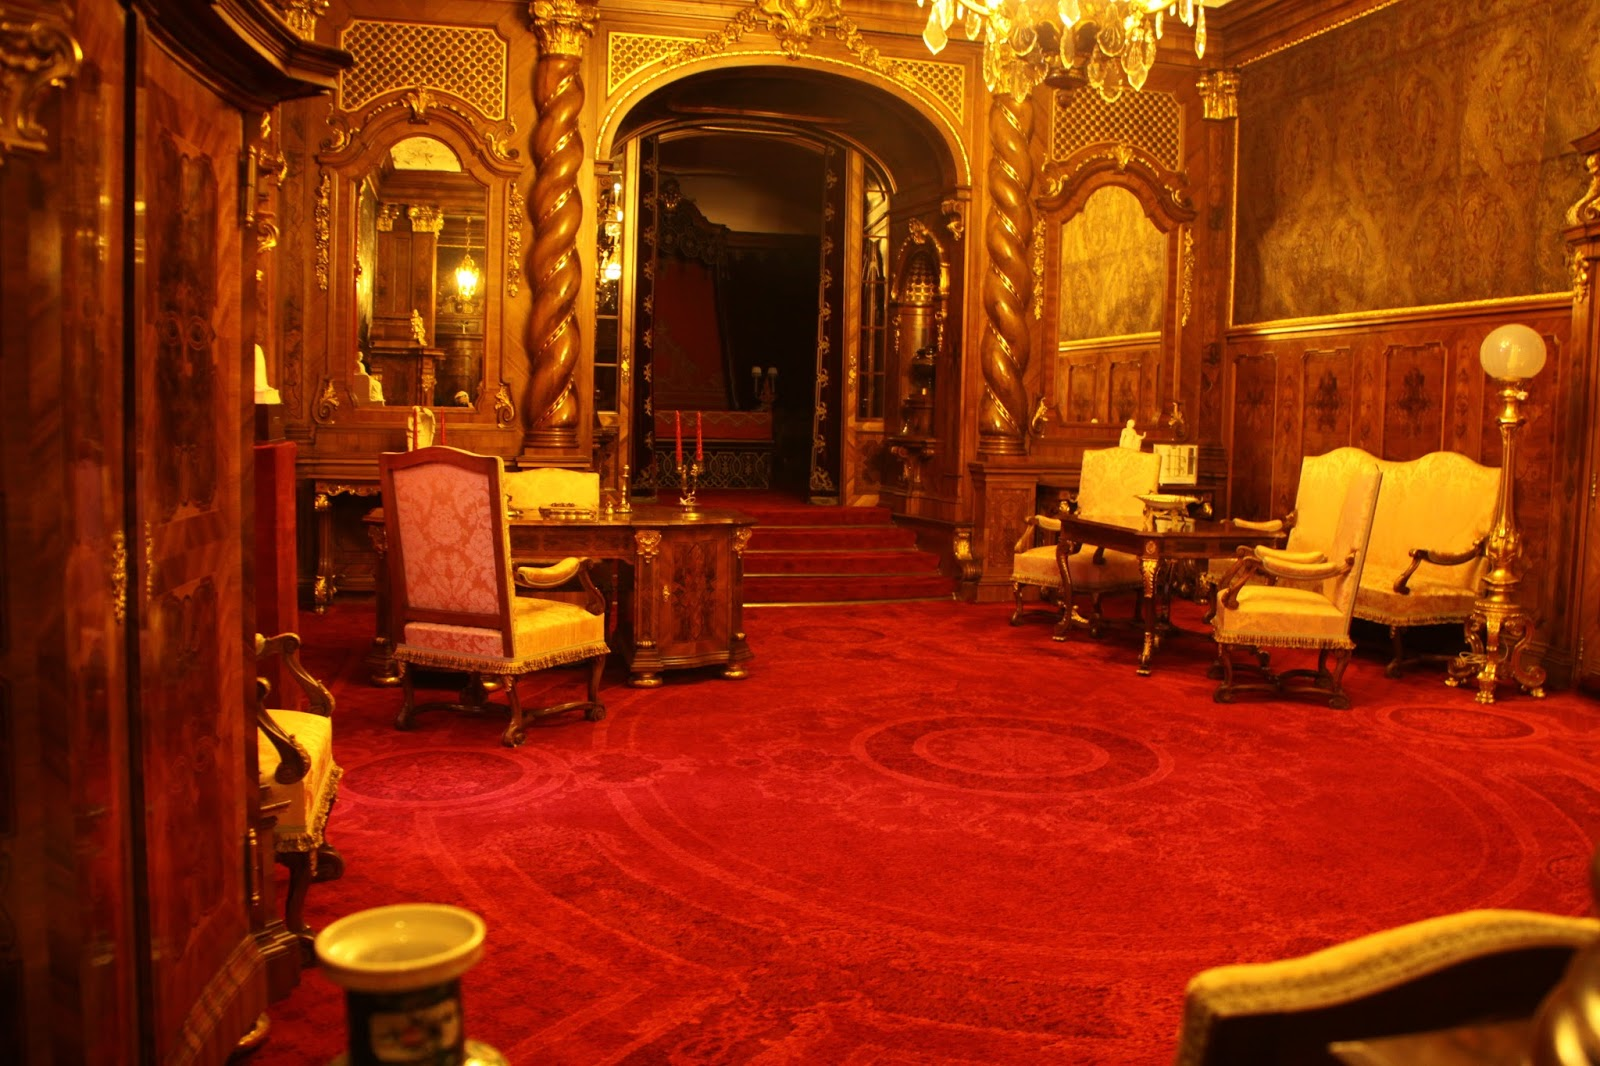 Fiorentino Sala Veneziana La Sala Da Pranzo In Stile Neorinascimentale #370C00 1600 1066 Sala Da Pranzo Stile Country